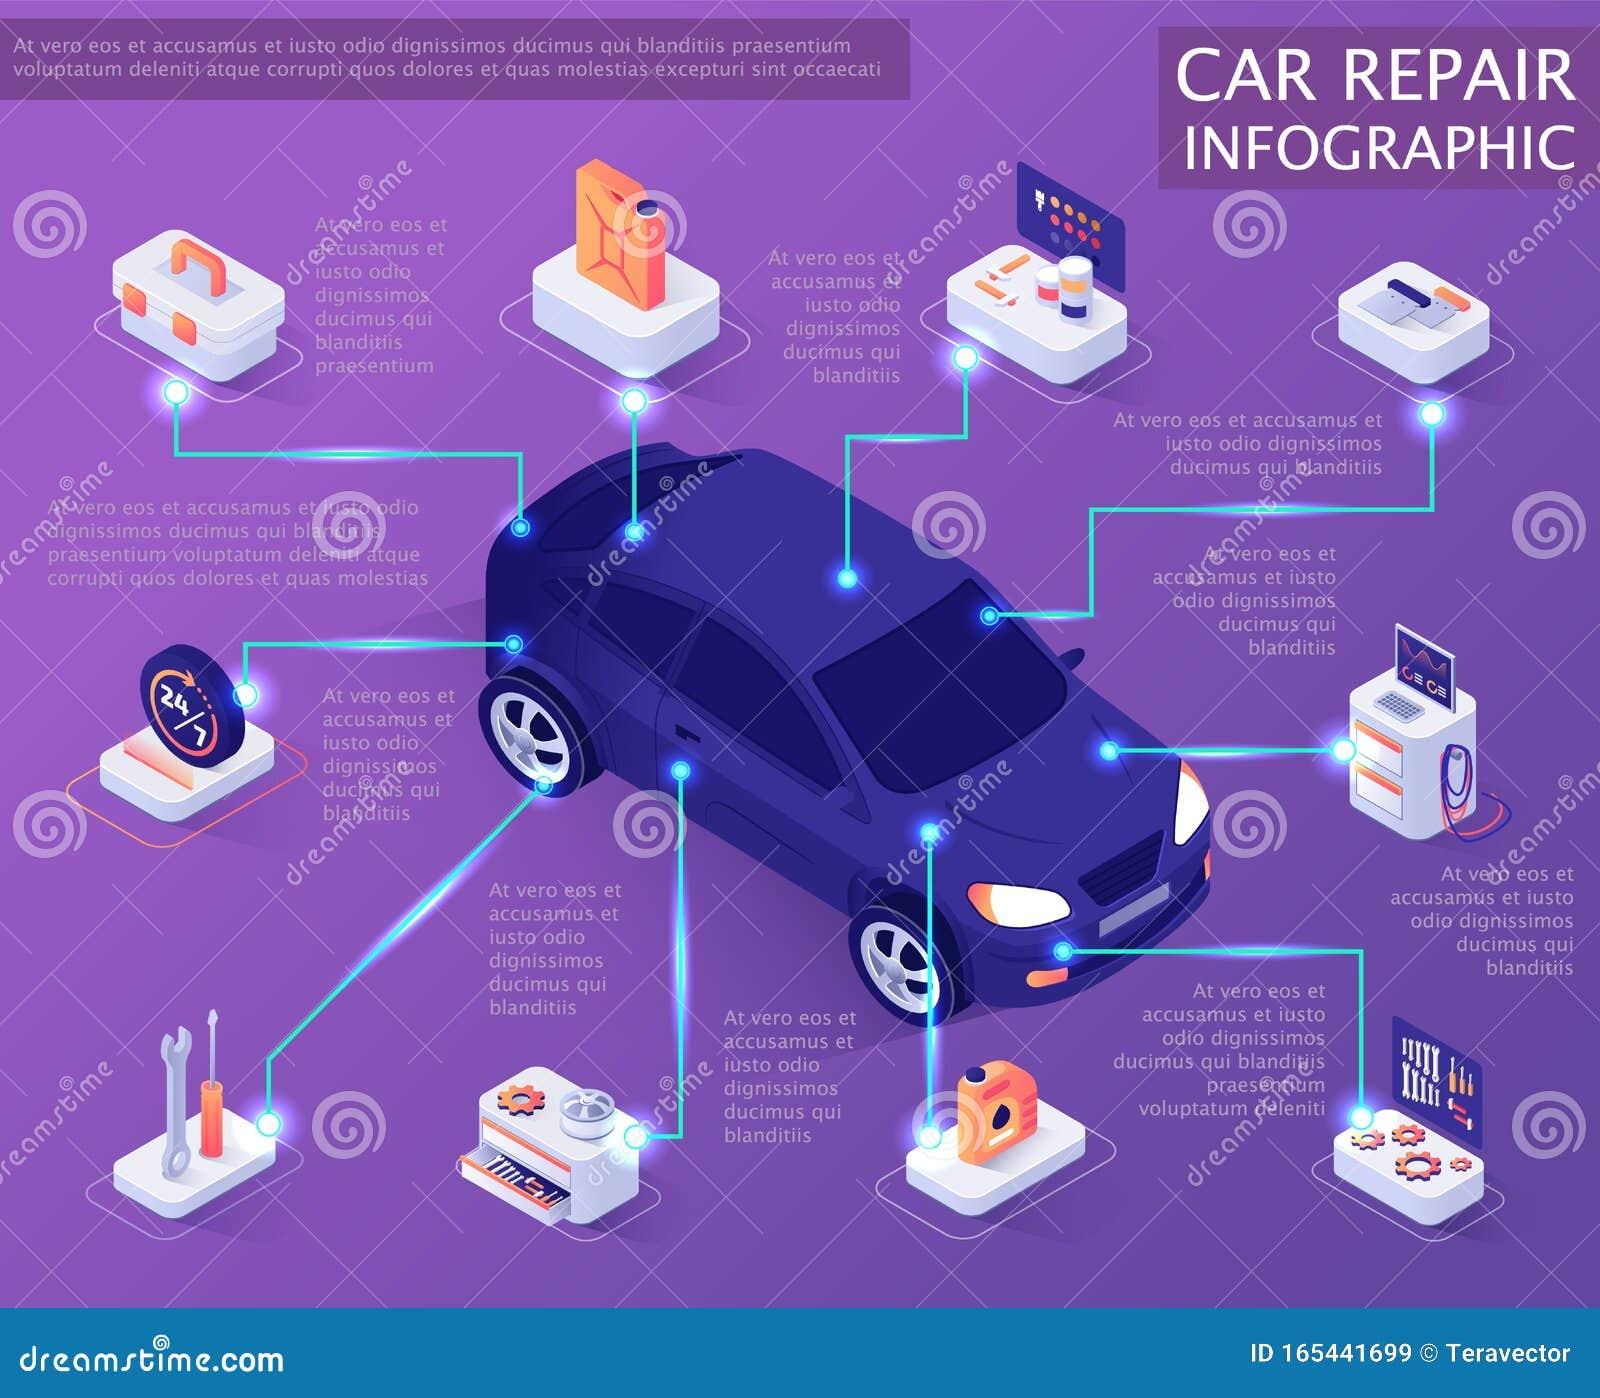 Car Repair Infographic In Isometric Banner Design Stock